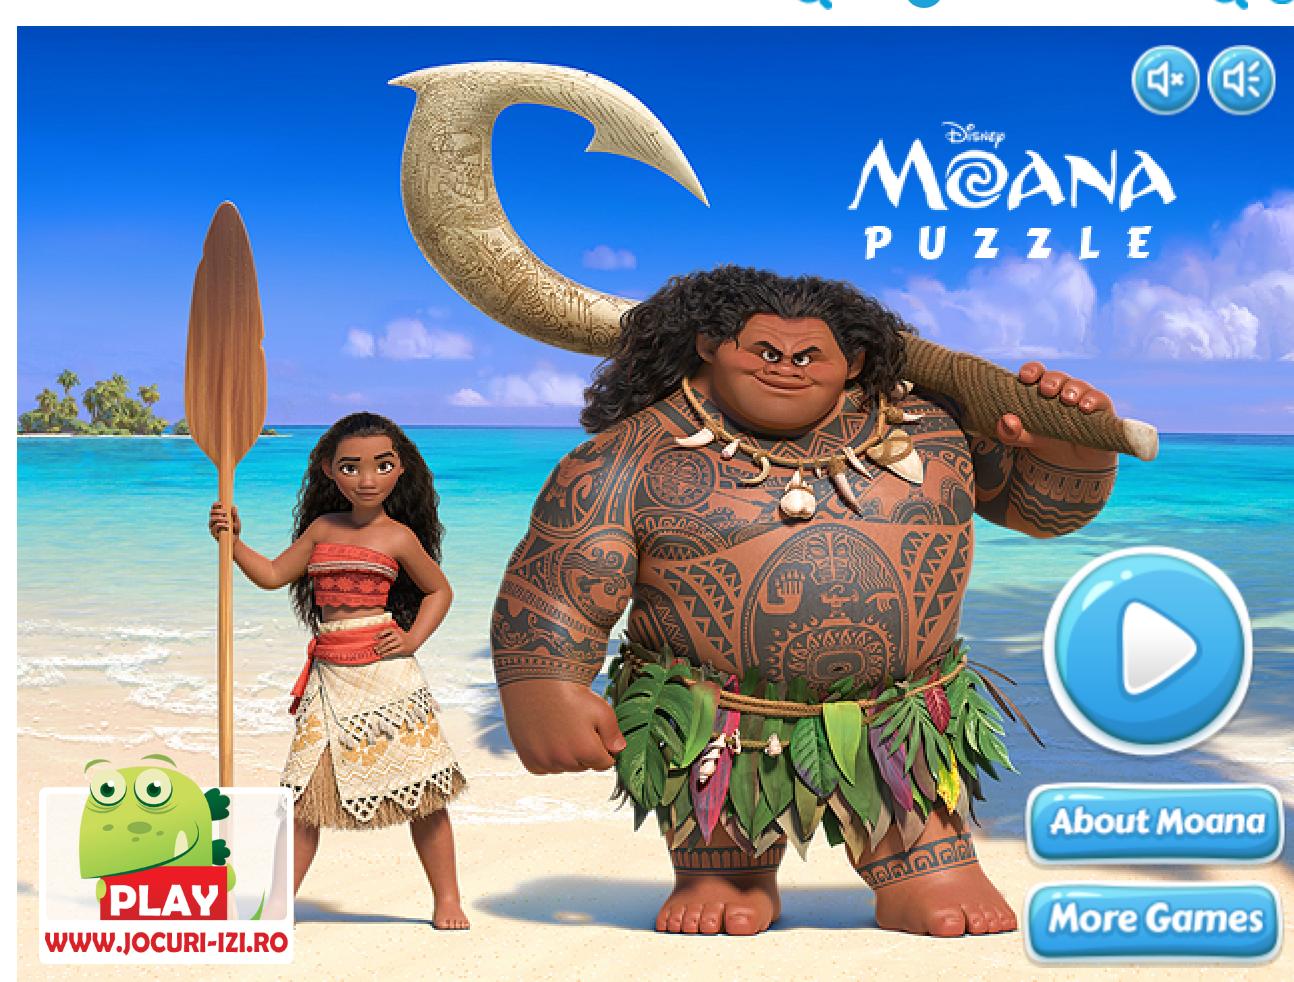 moana online free